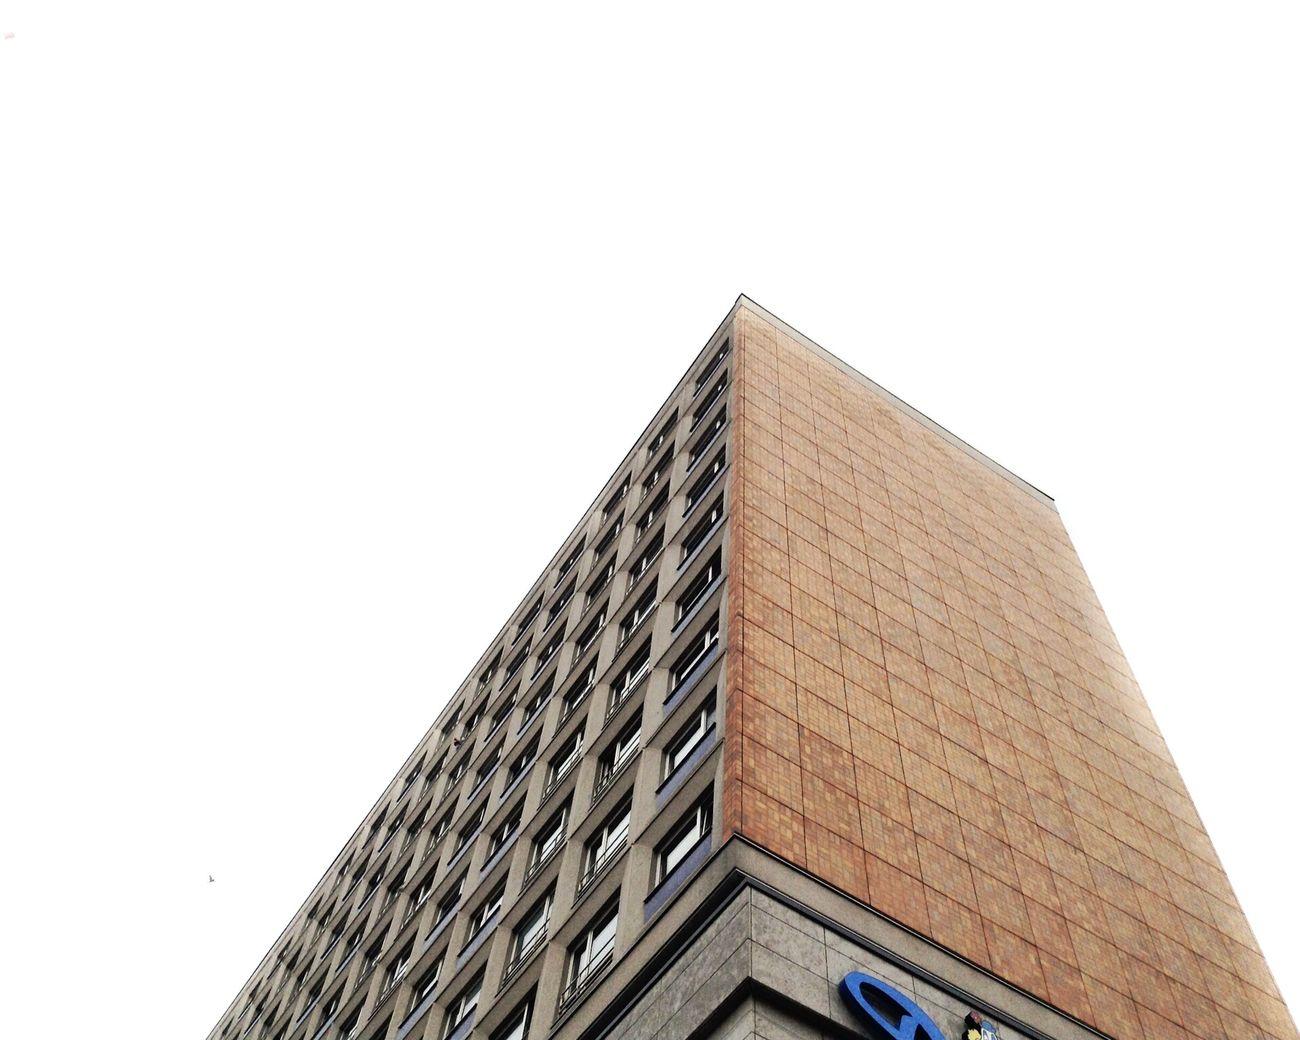 Urban Urban Geometry Urbanphotography Architectural Detail Minimalism Minimal The Architect - 2015 EyeEm Awards